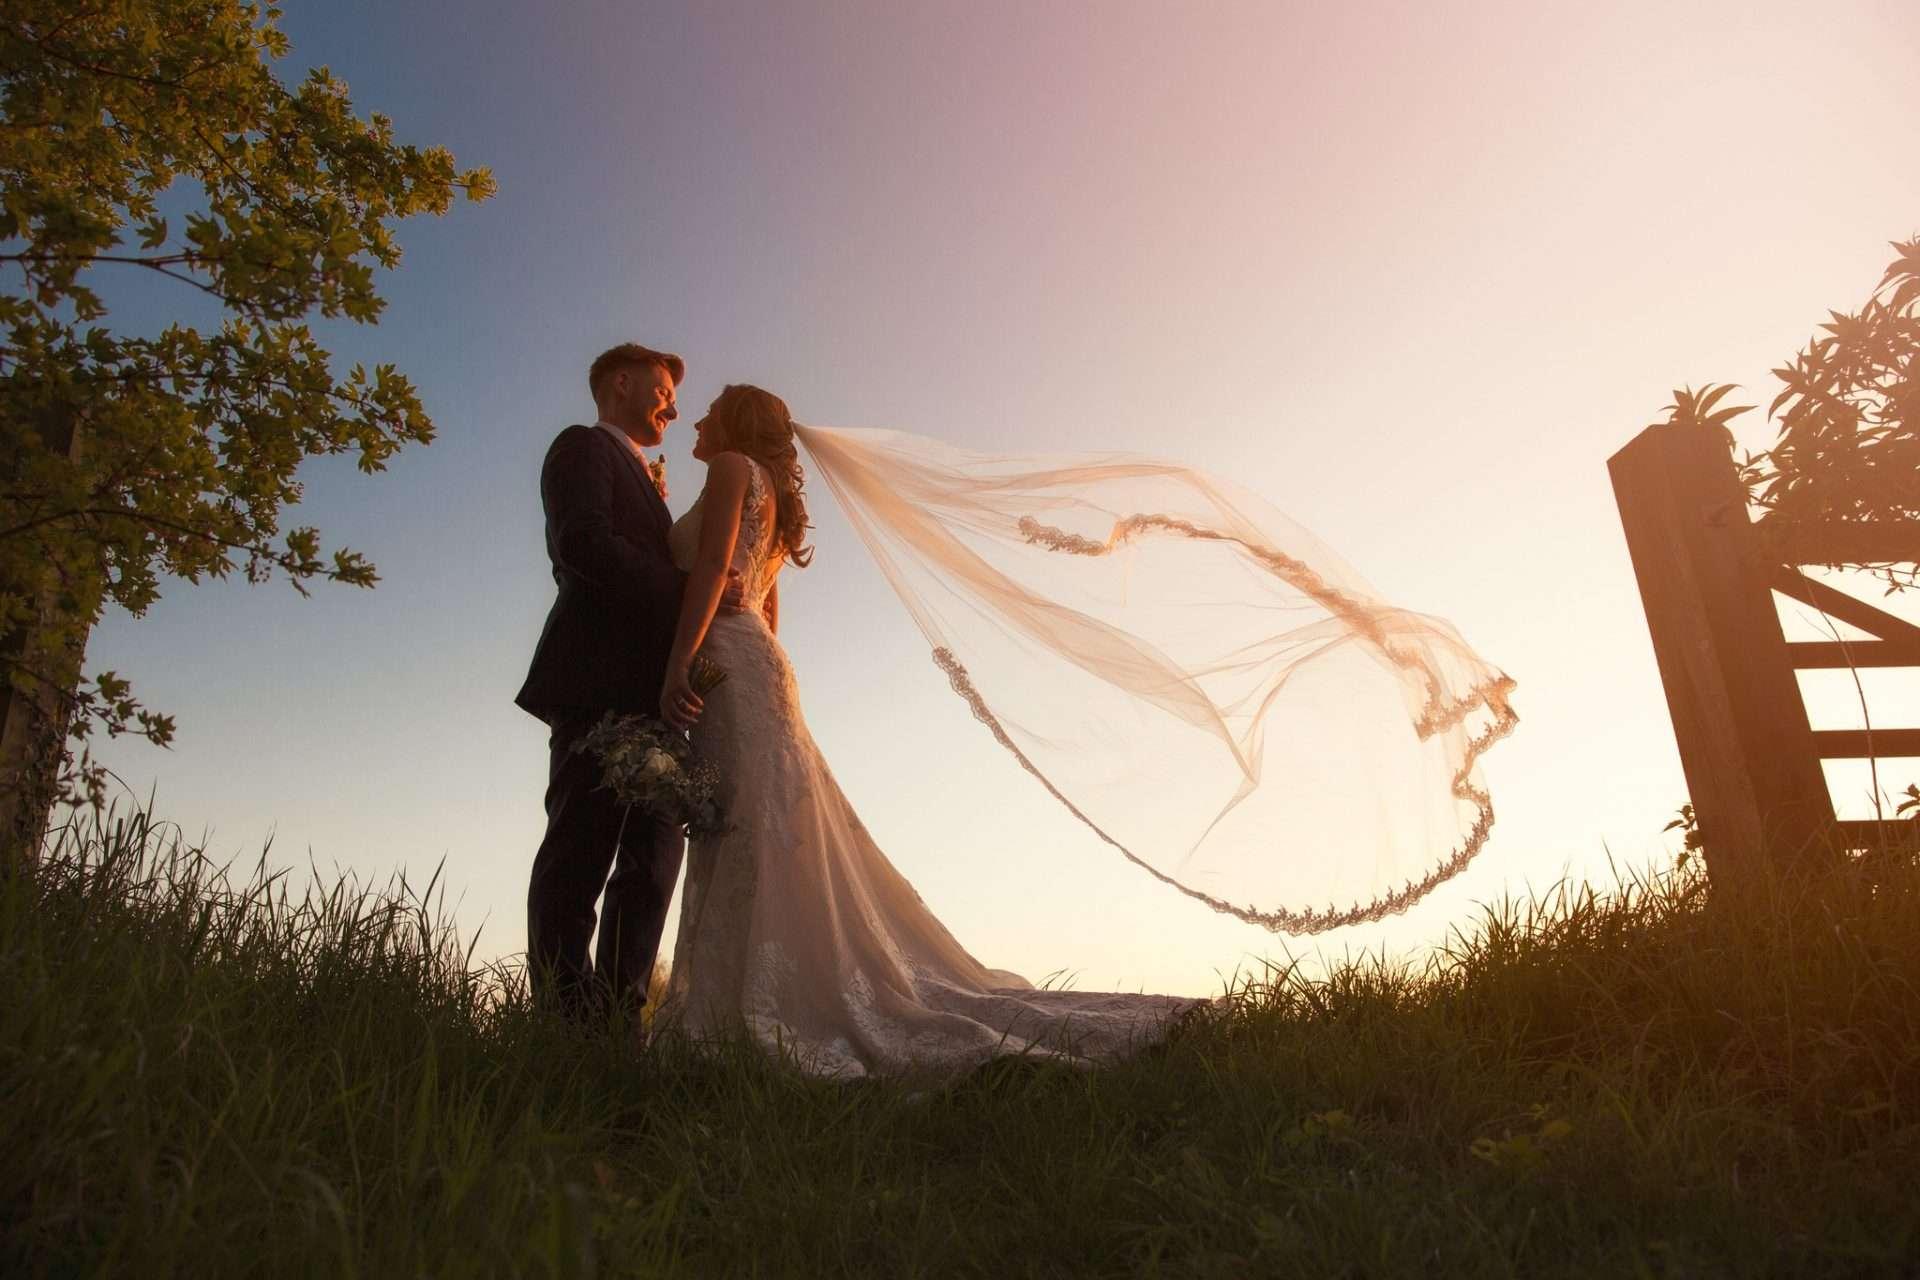 Essex-wedding-photography-Chris-Woodman-photography-05